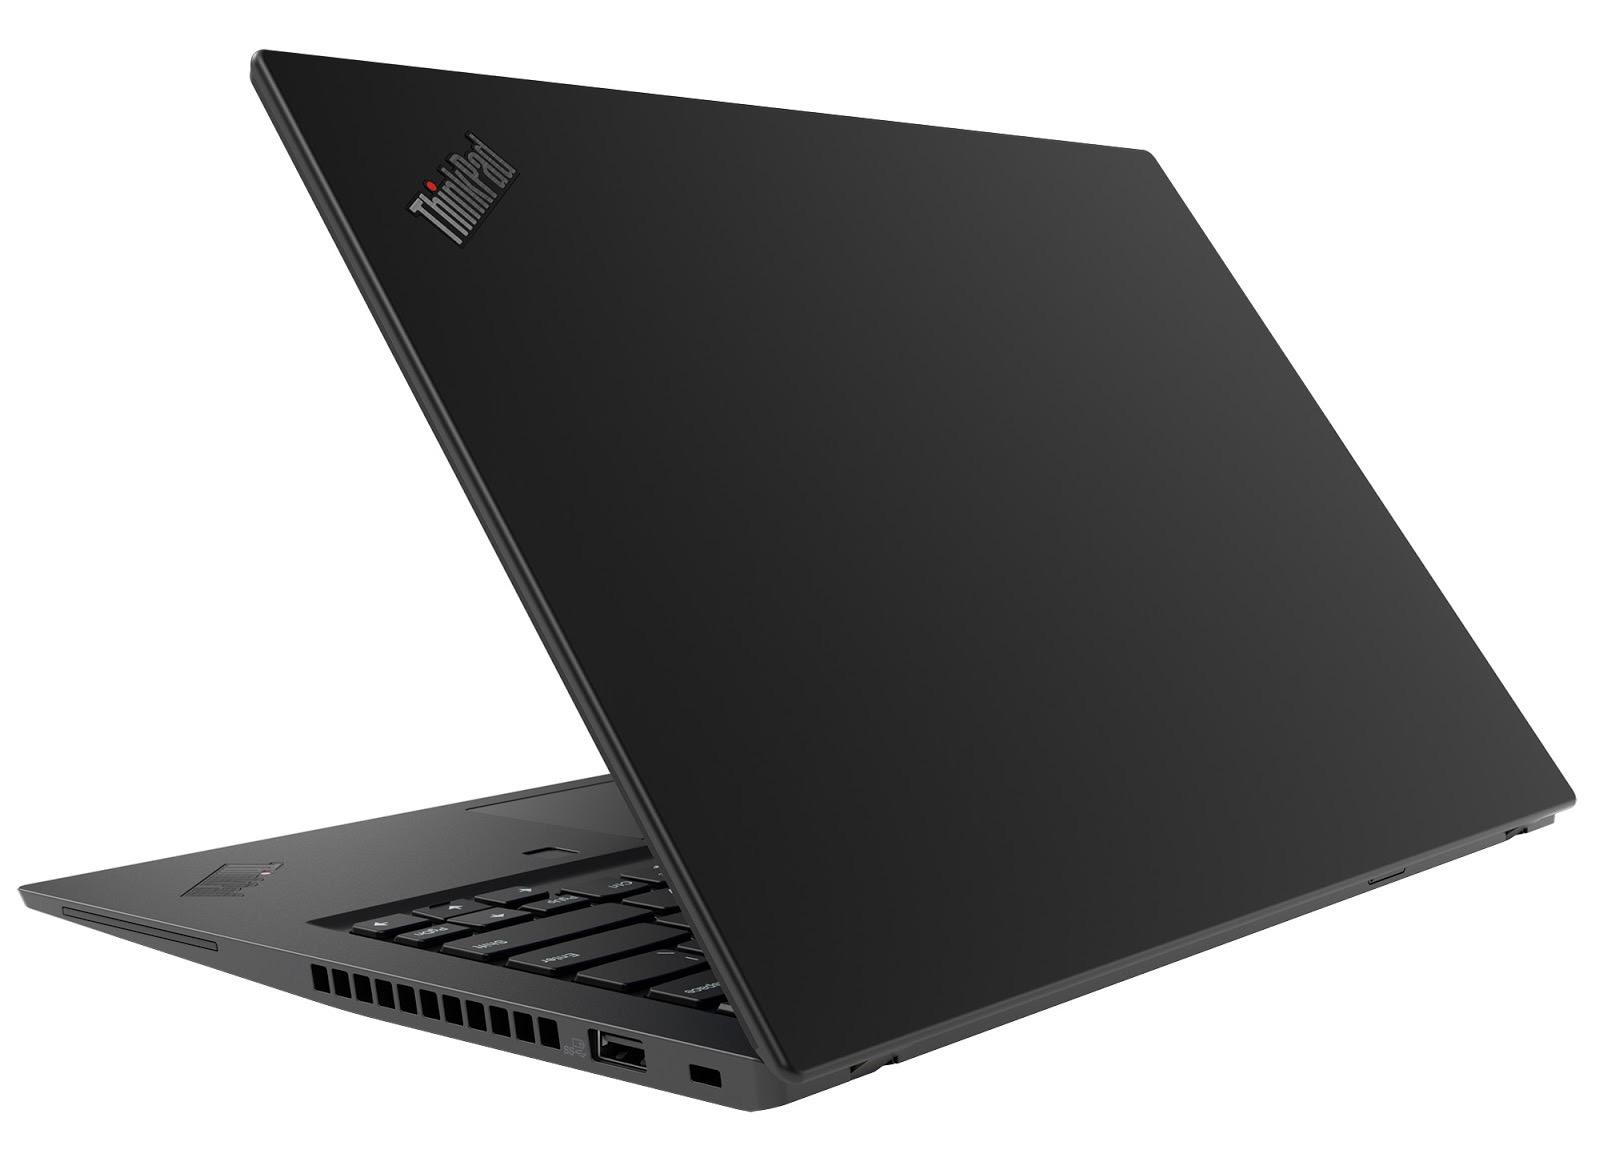 Фото 2. Ноутбук Lenovo ThinkPad T14s Gen 1 Black (20T00015RT)